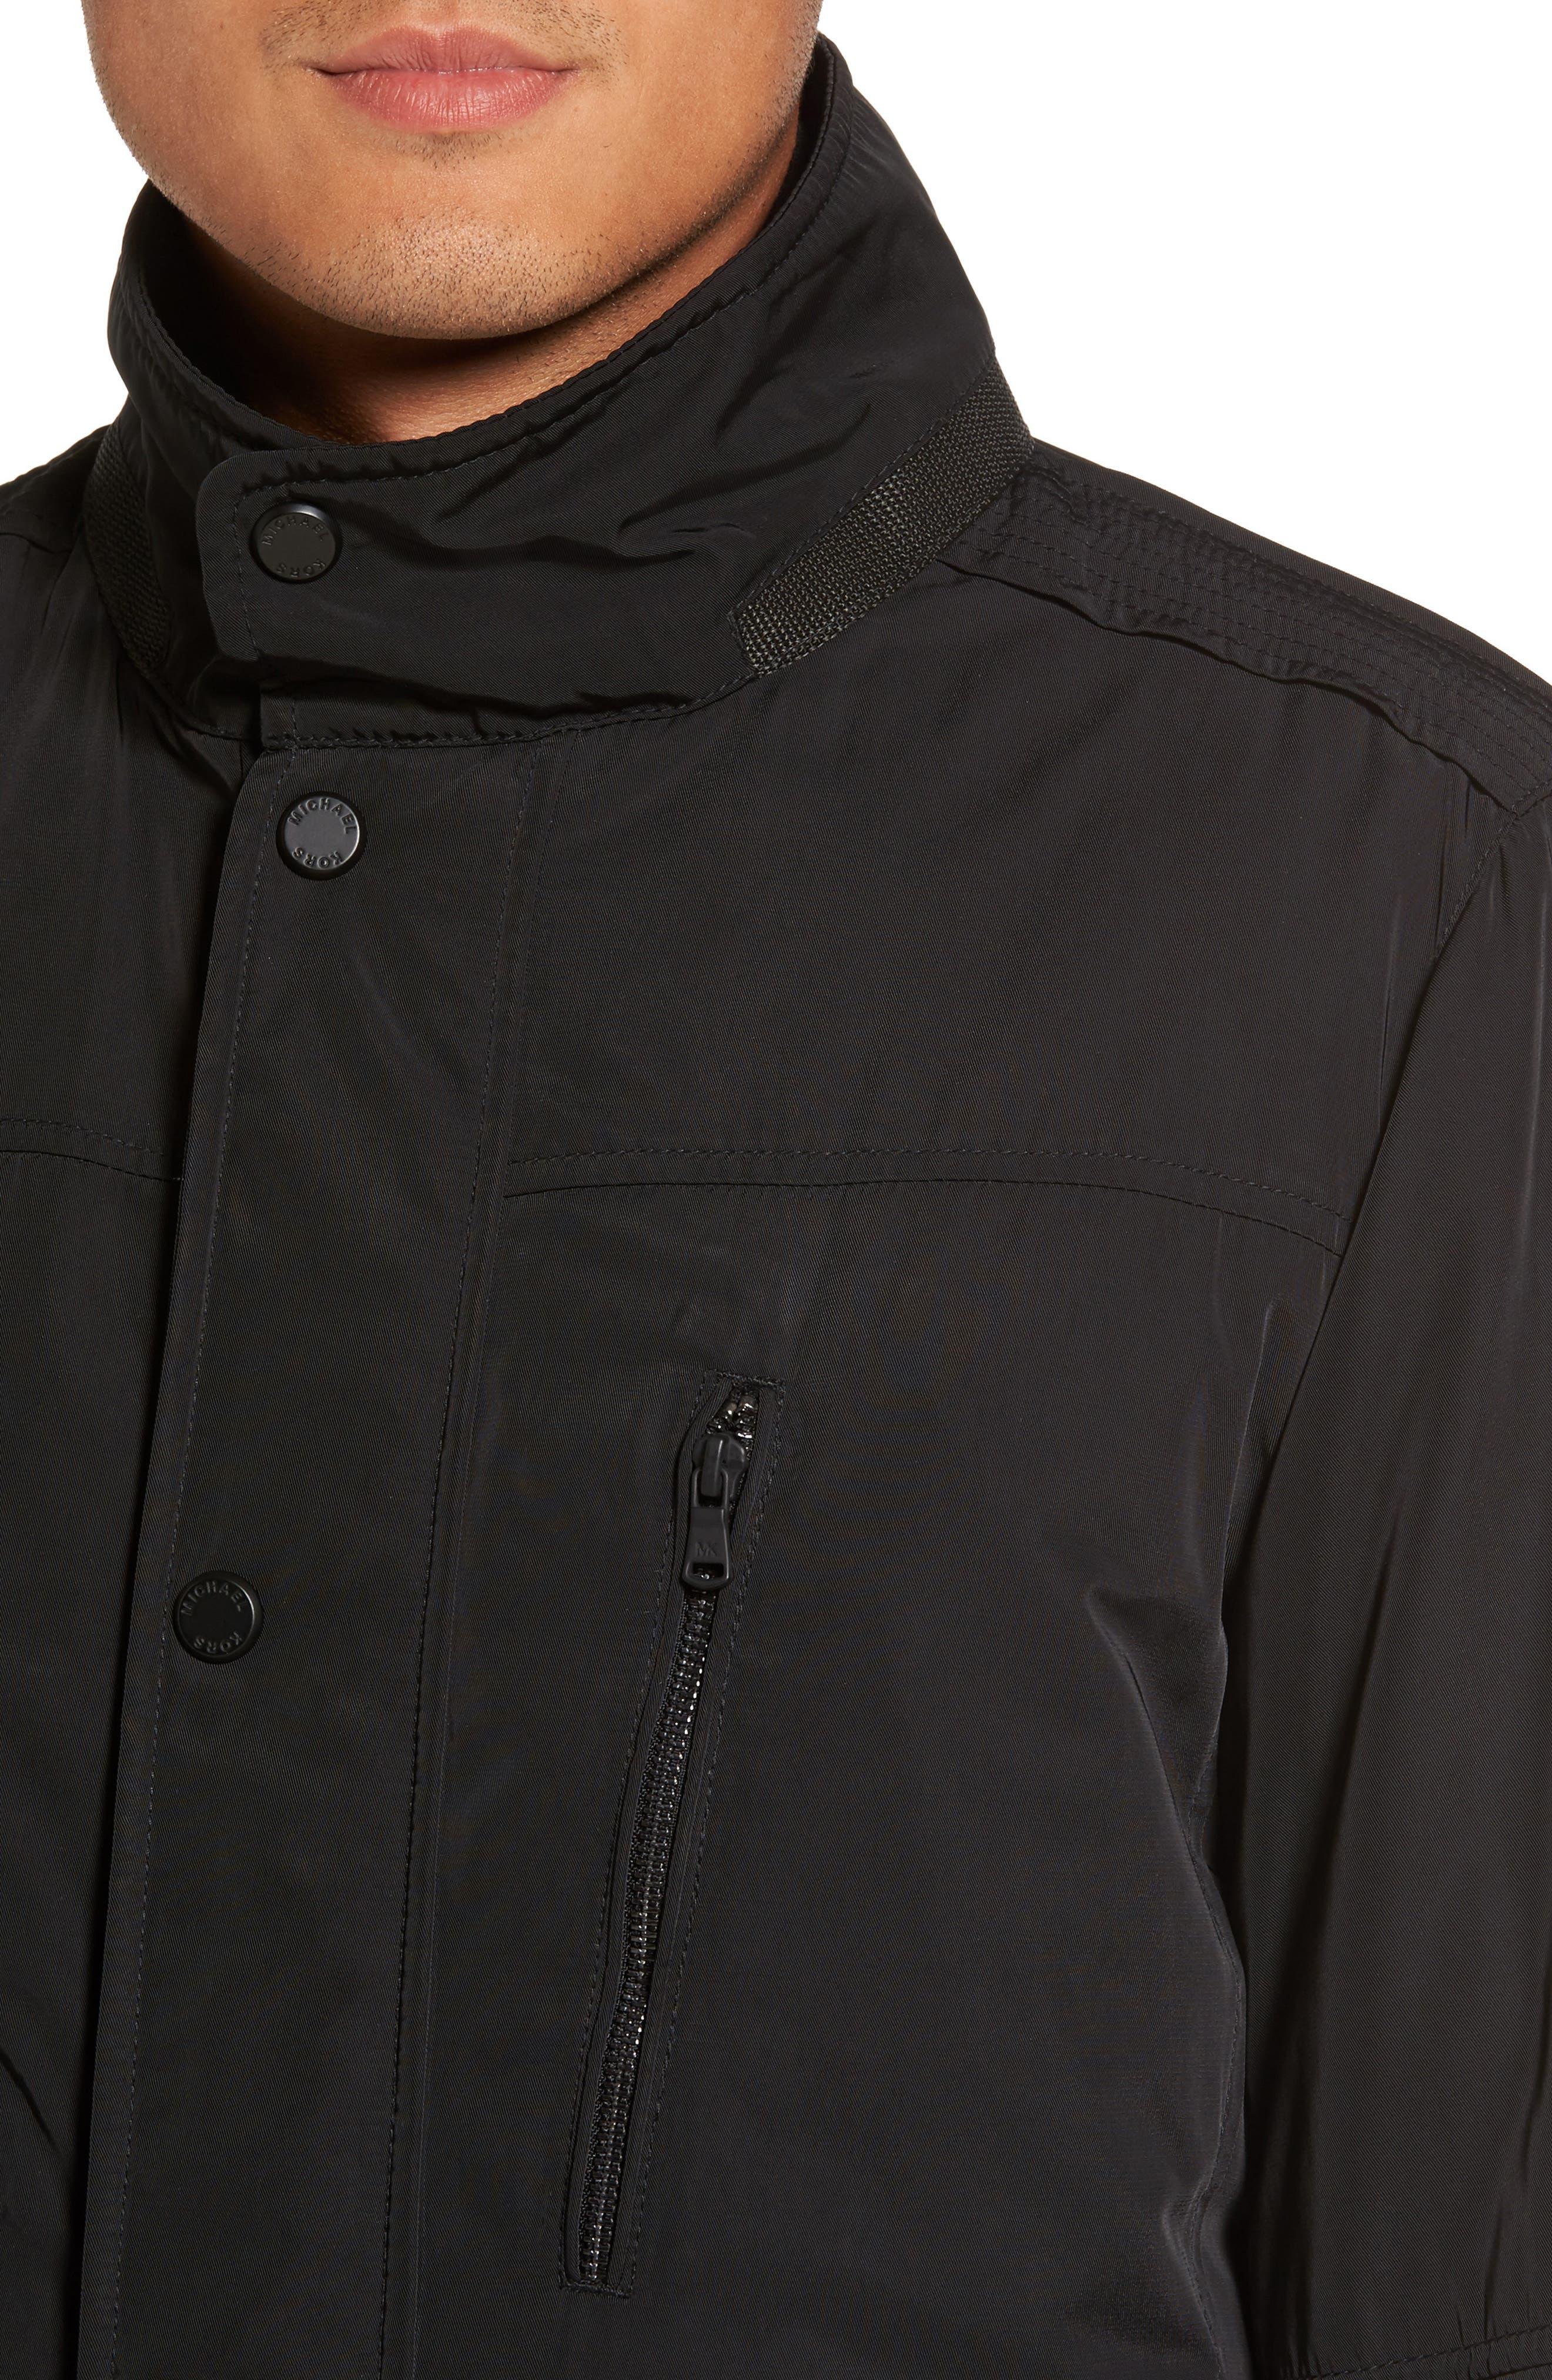 Field Coat,                             Alternate thumbnail 4, color,                             001